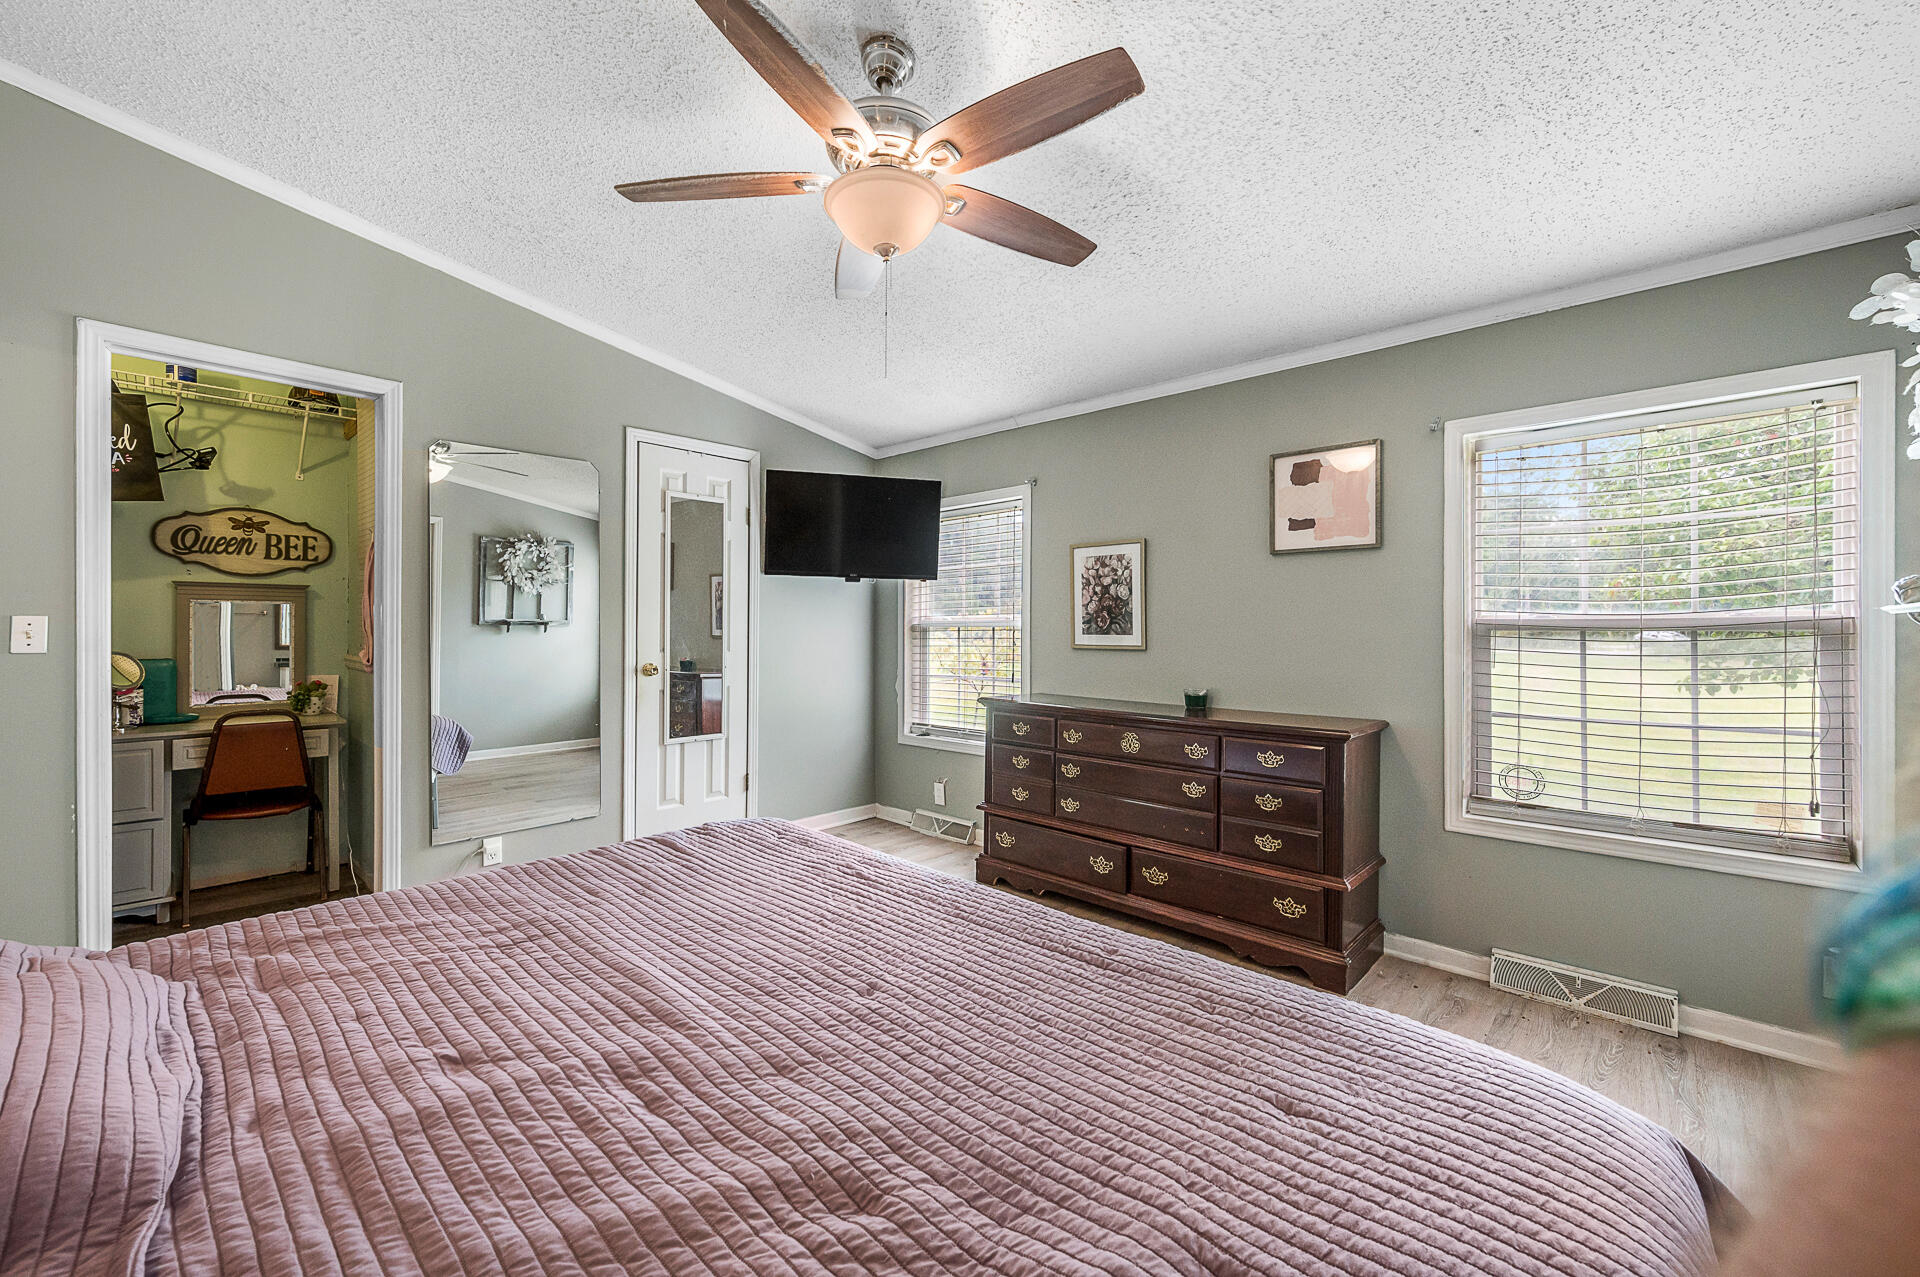 Clemson Terrace Homes For Sale - 250 Medina, Summerville, SC - 22